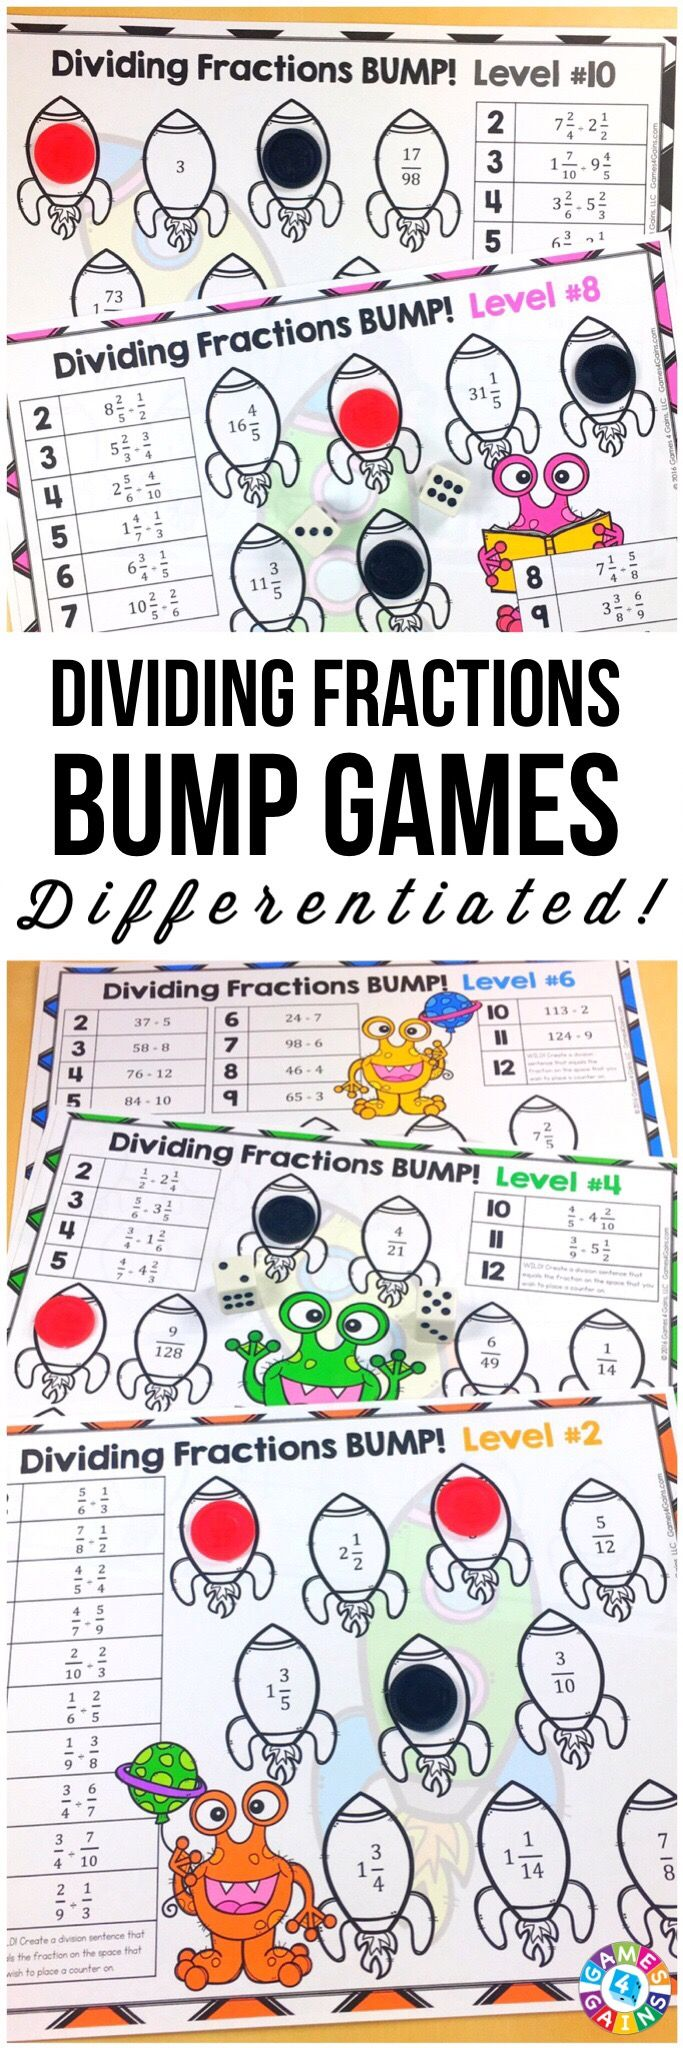 Dividing Fractions & Dividing Mixed Numbers Bump Games {57, 6ns1}